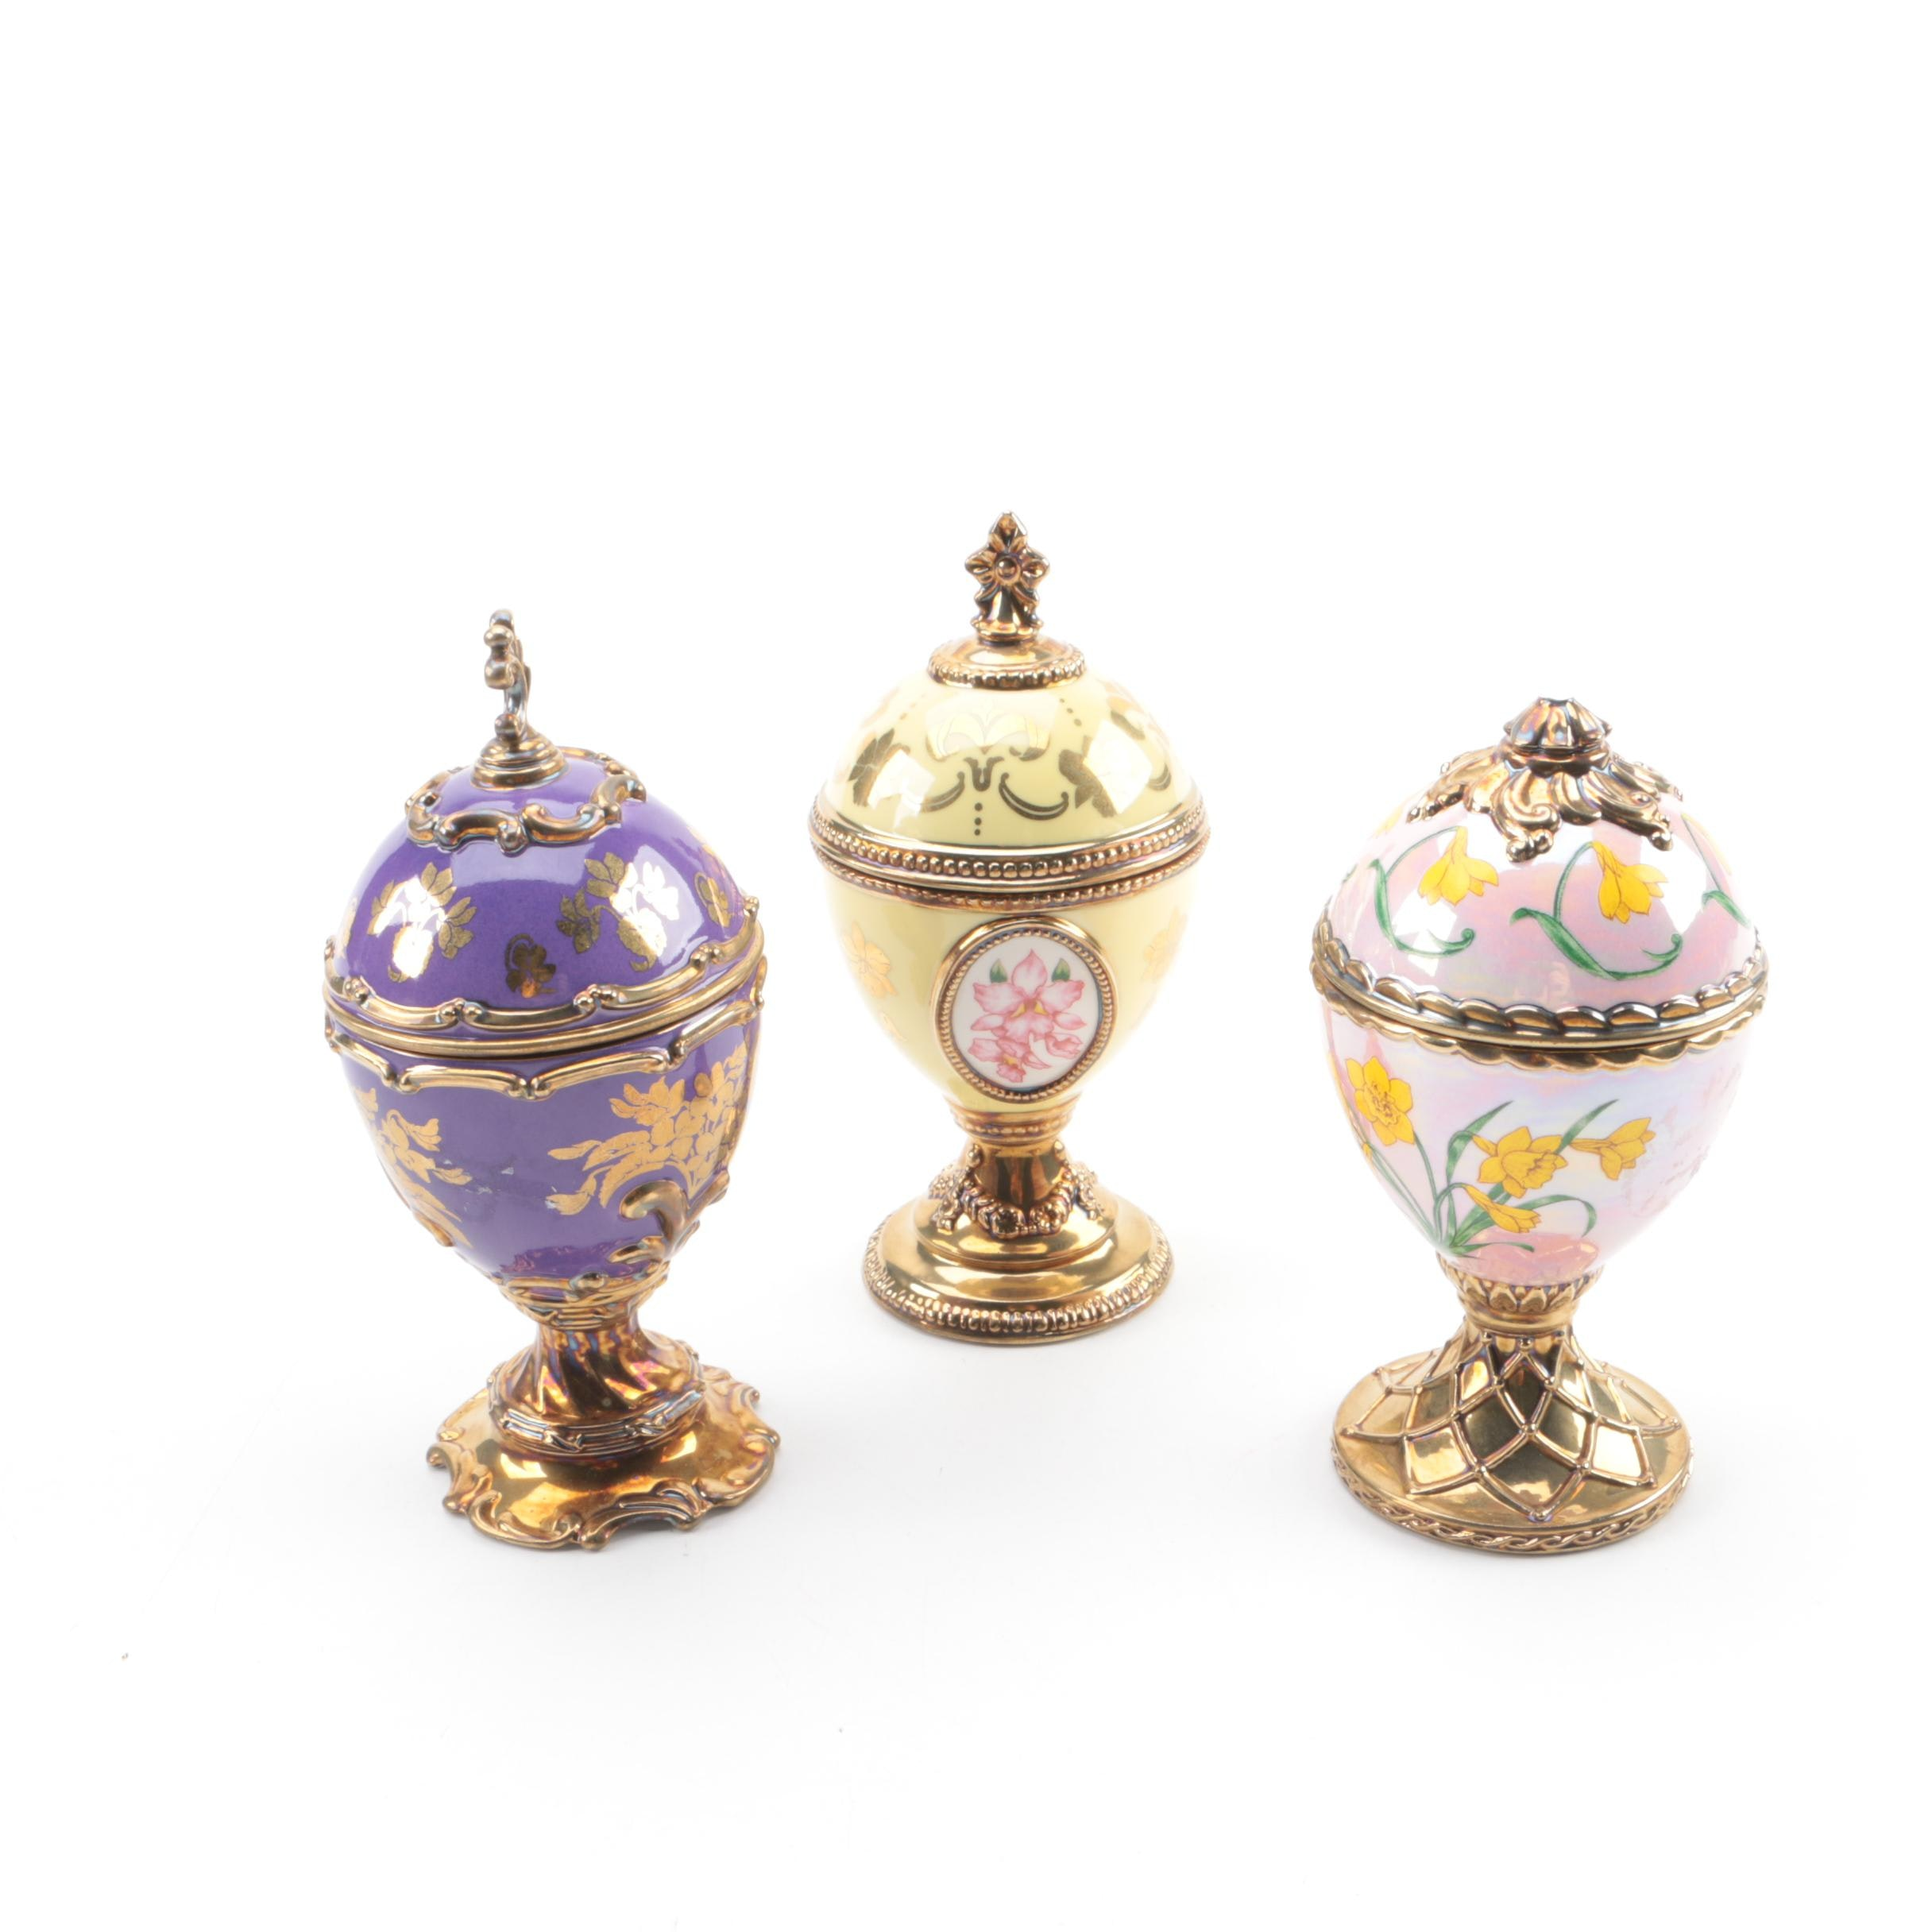 House of Fabergé Musical Eggs